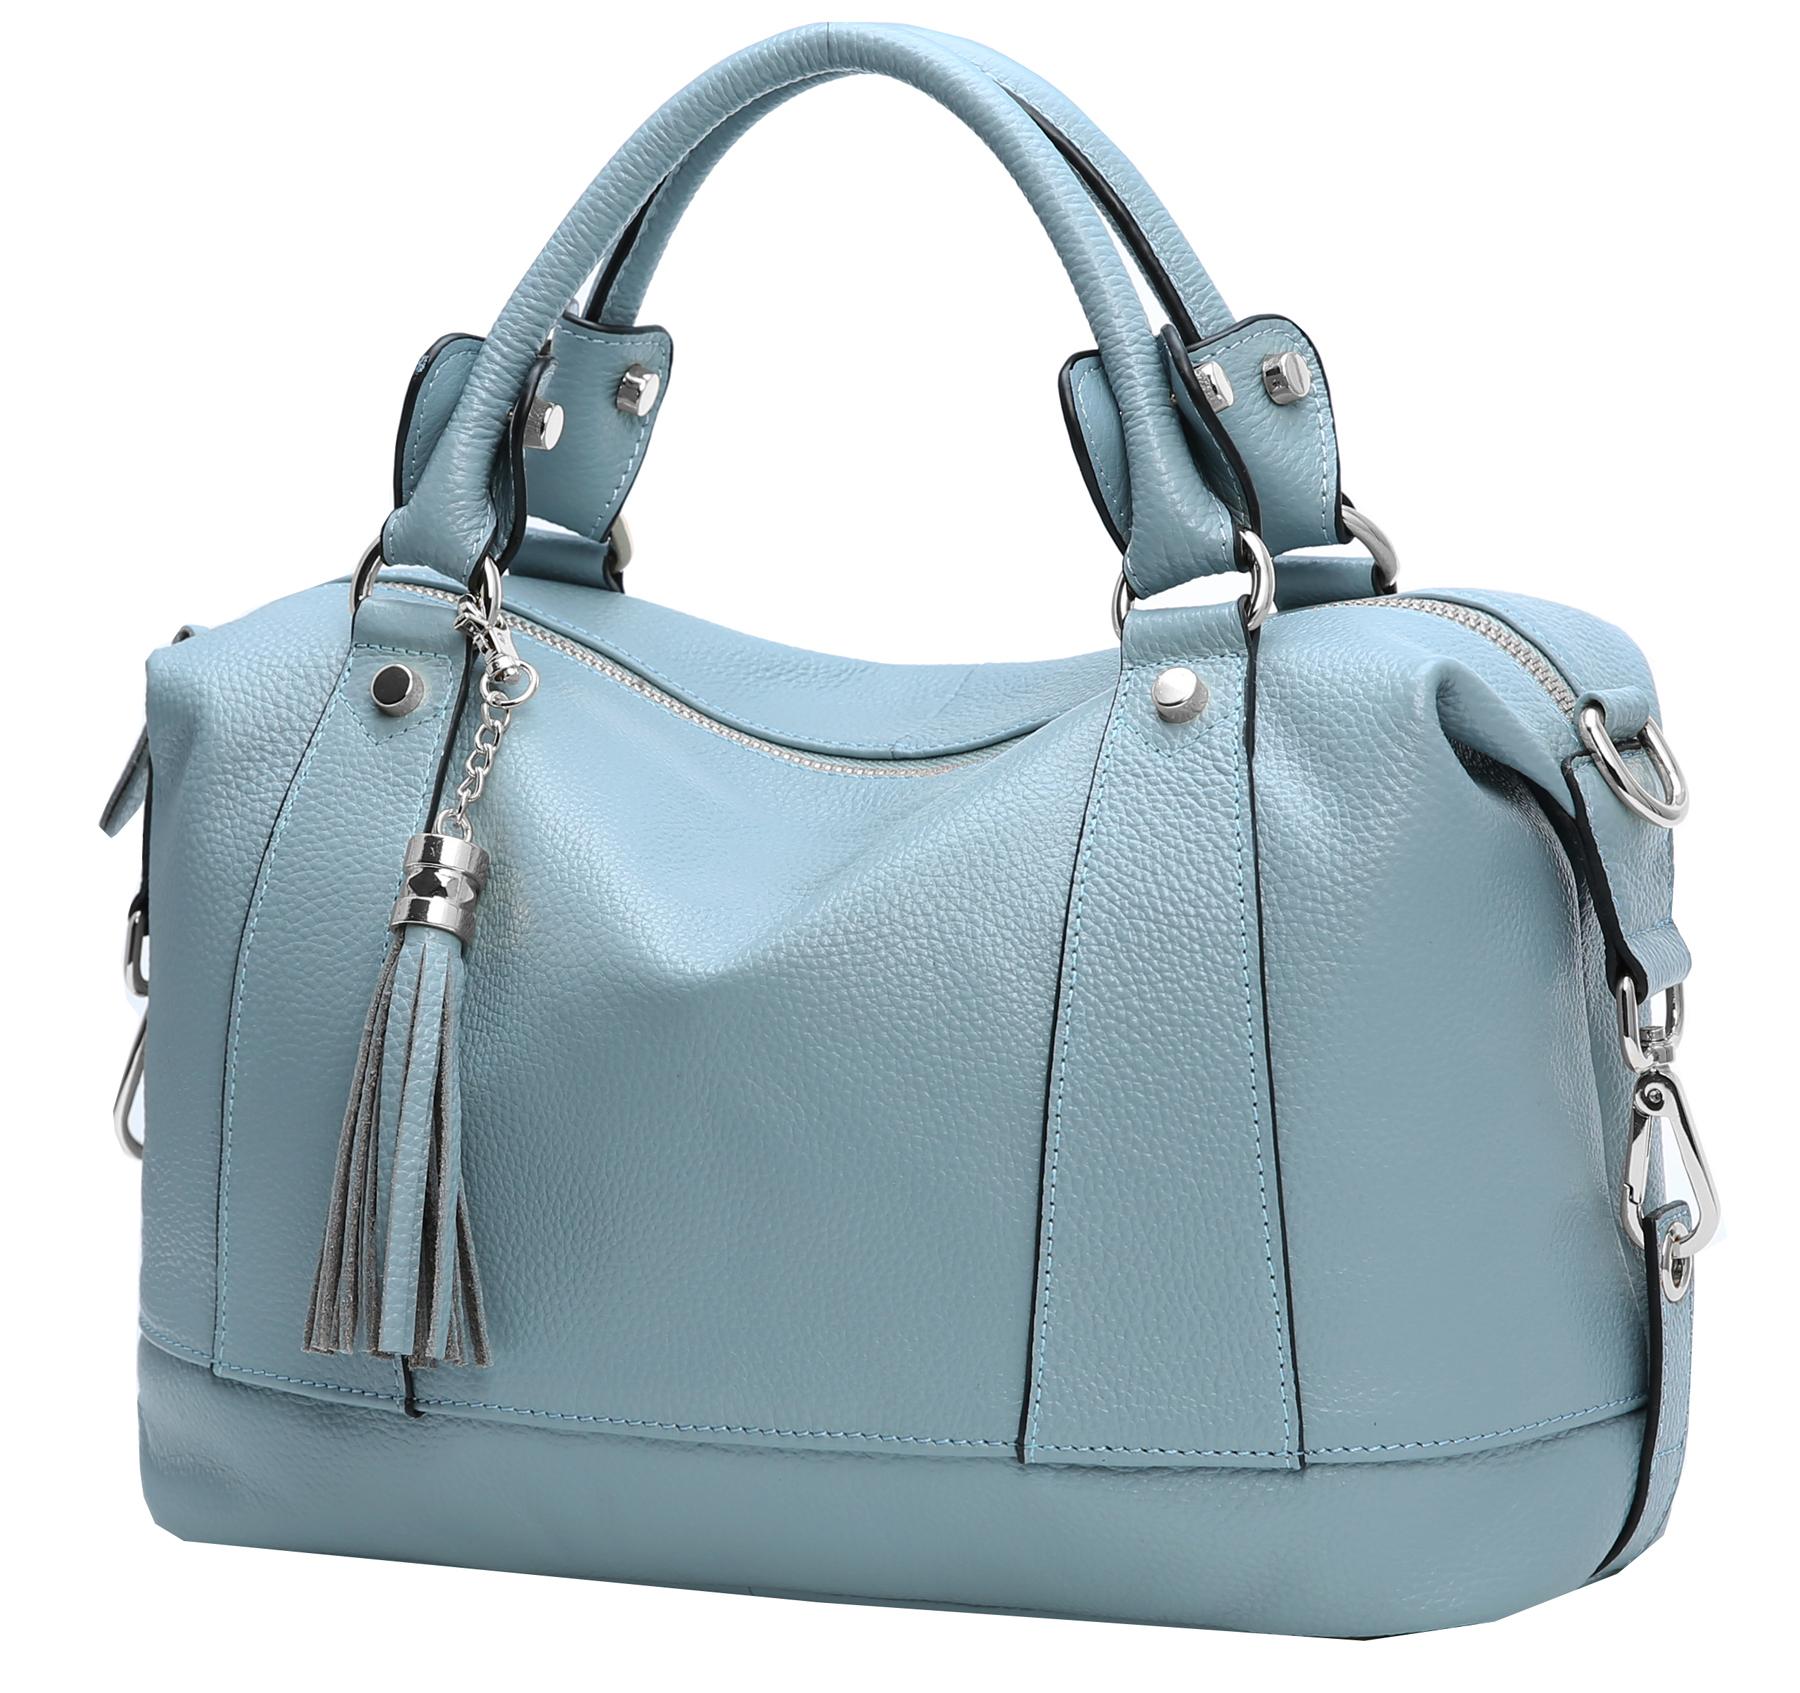 edc22cd538 Heshe Leather Shoulder Bag Womens Tote Top Handle Handbags Cross ...